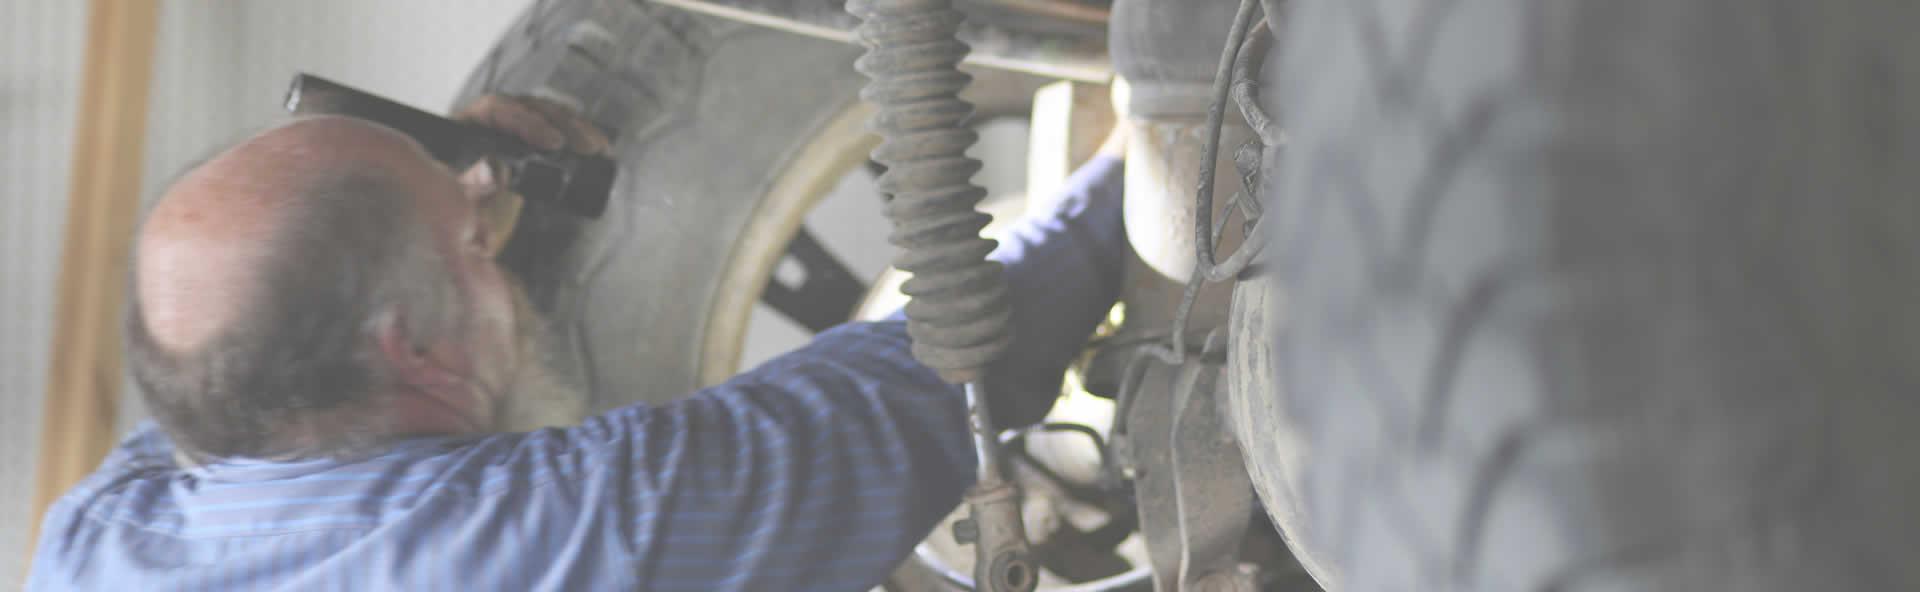 NAPA Certified Auto Repair